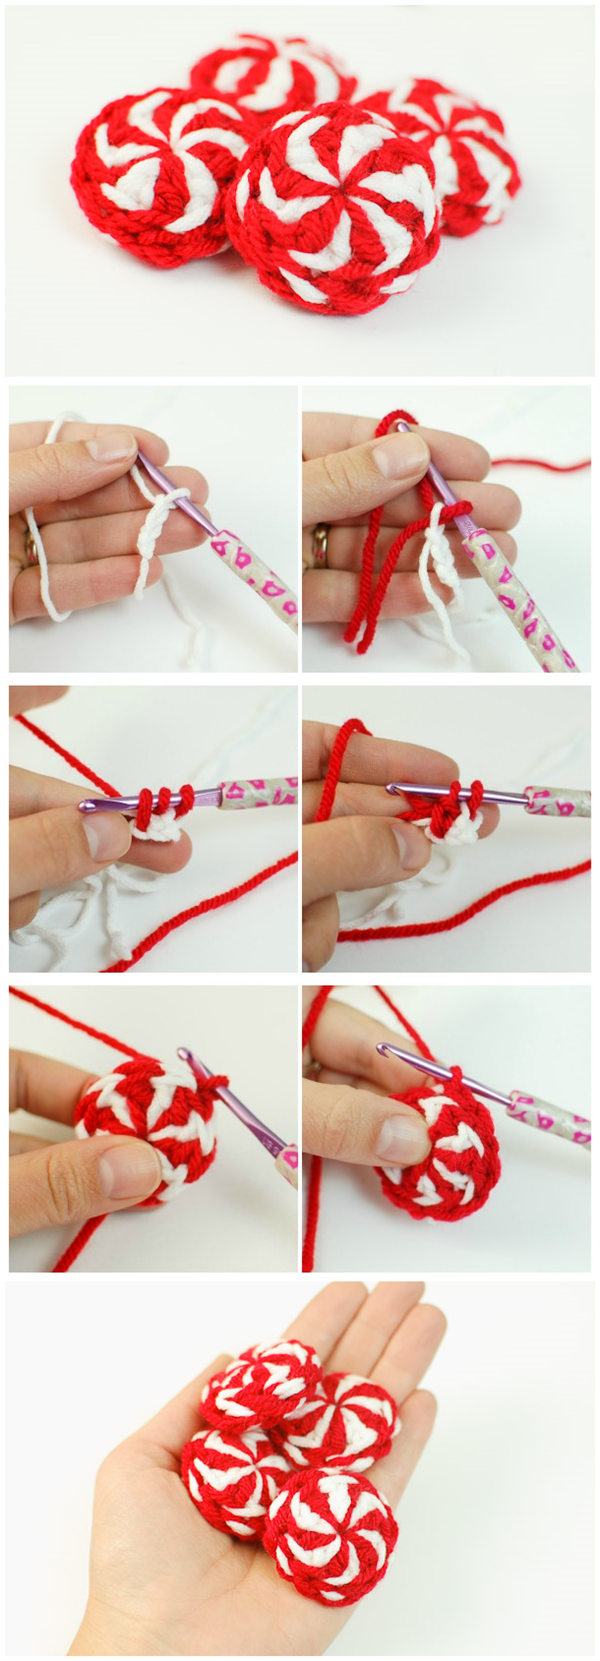 Peppermint Candy Christmas Crochet Pattern